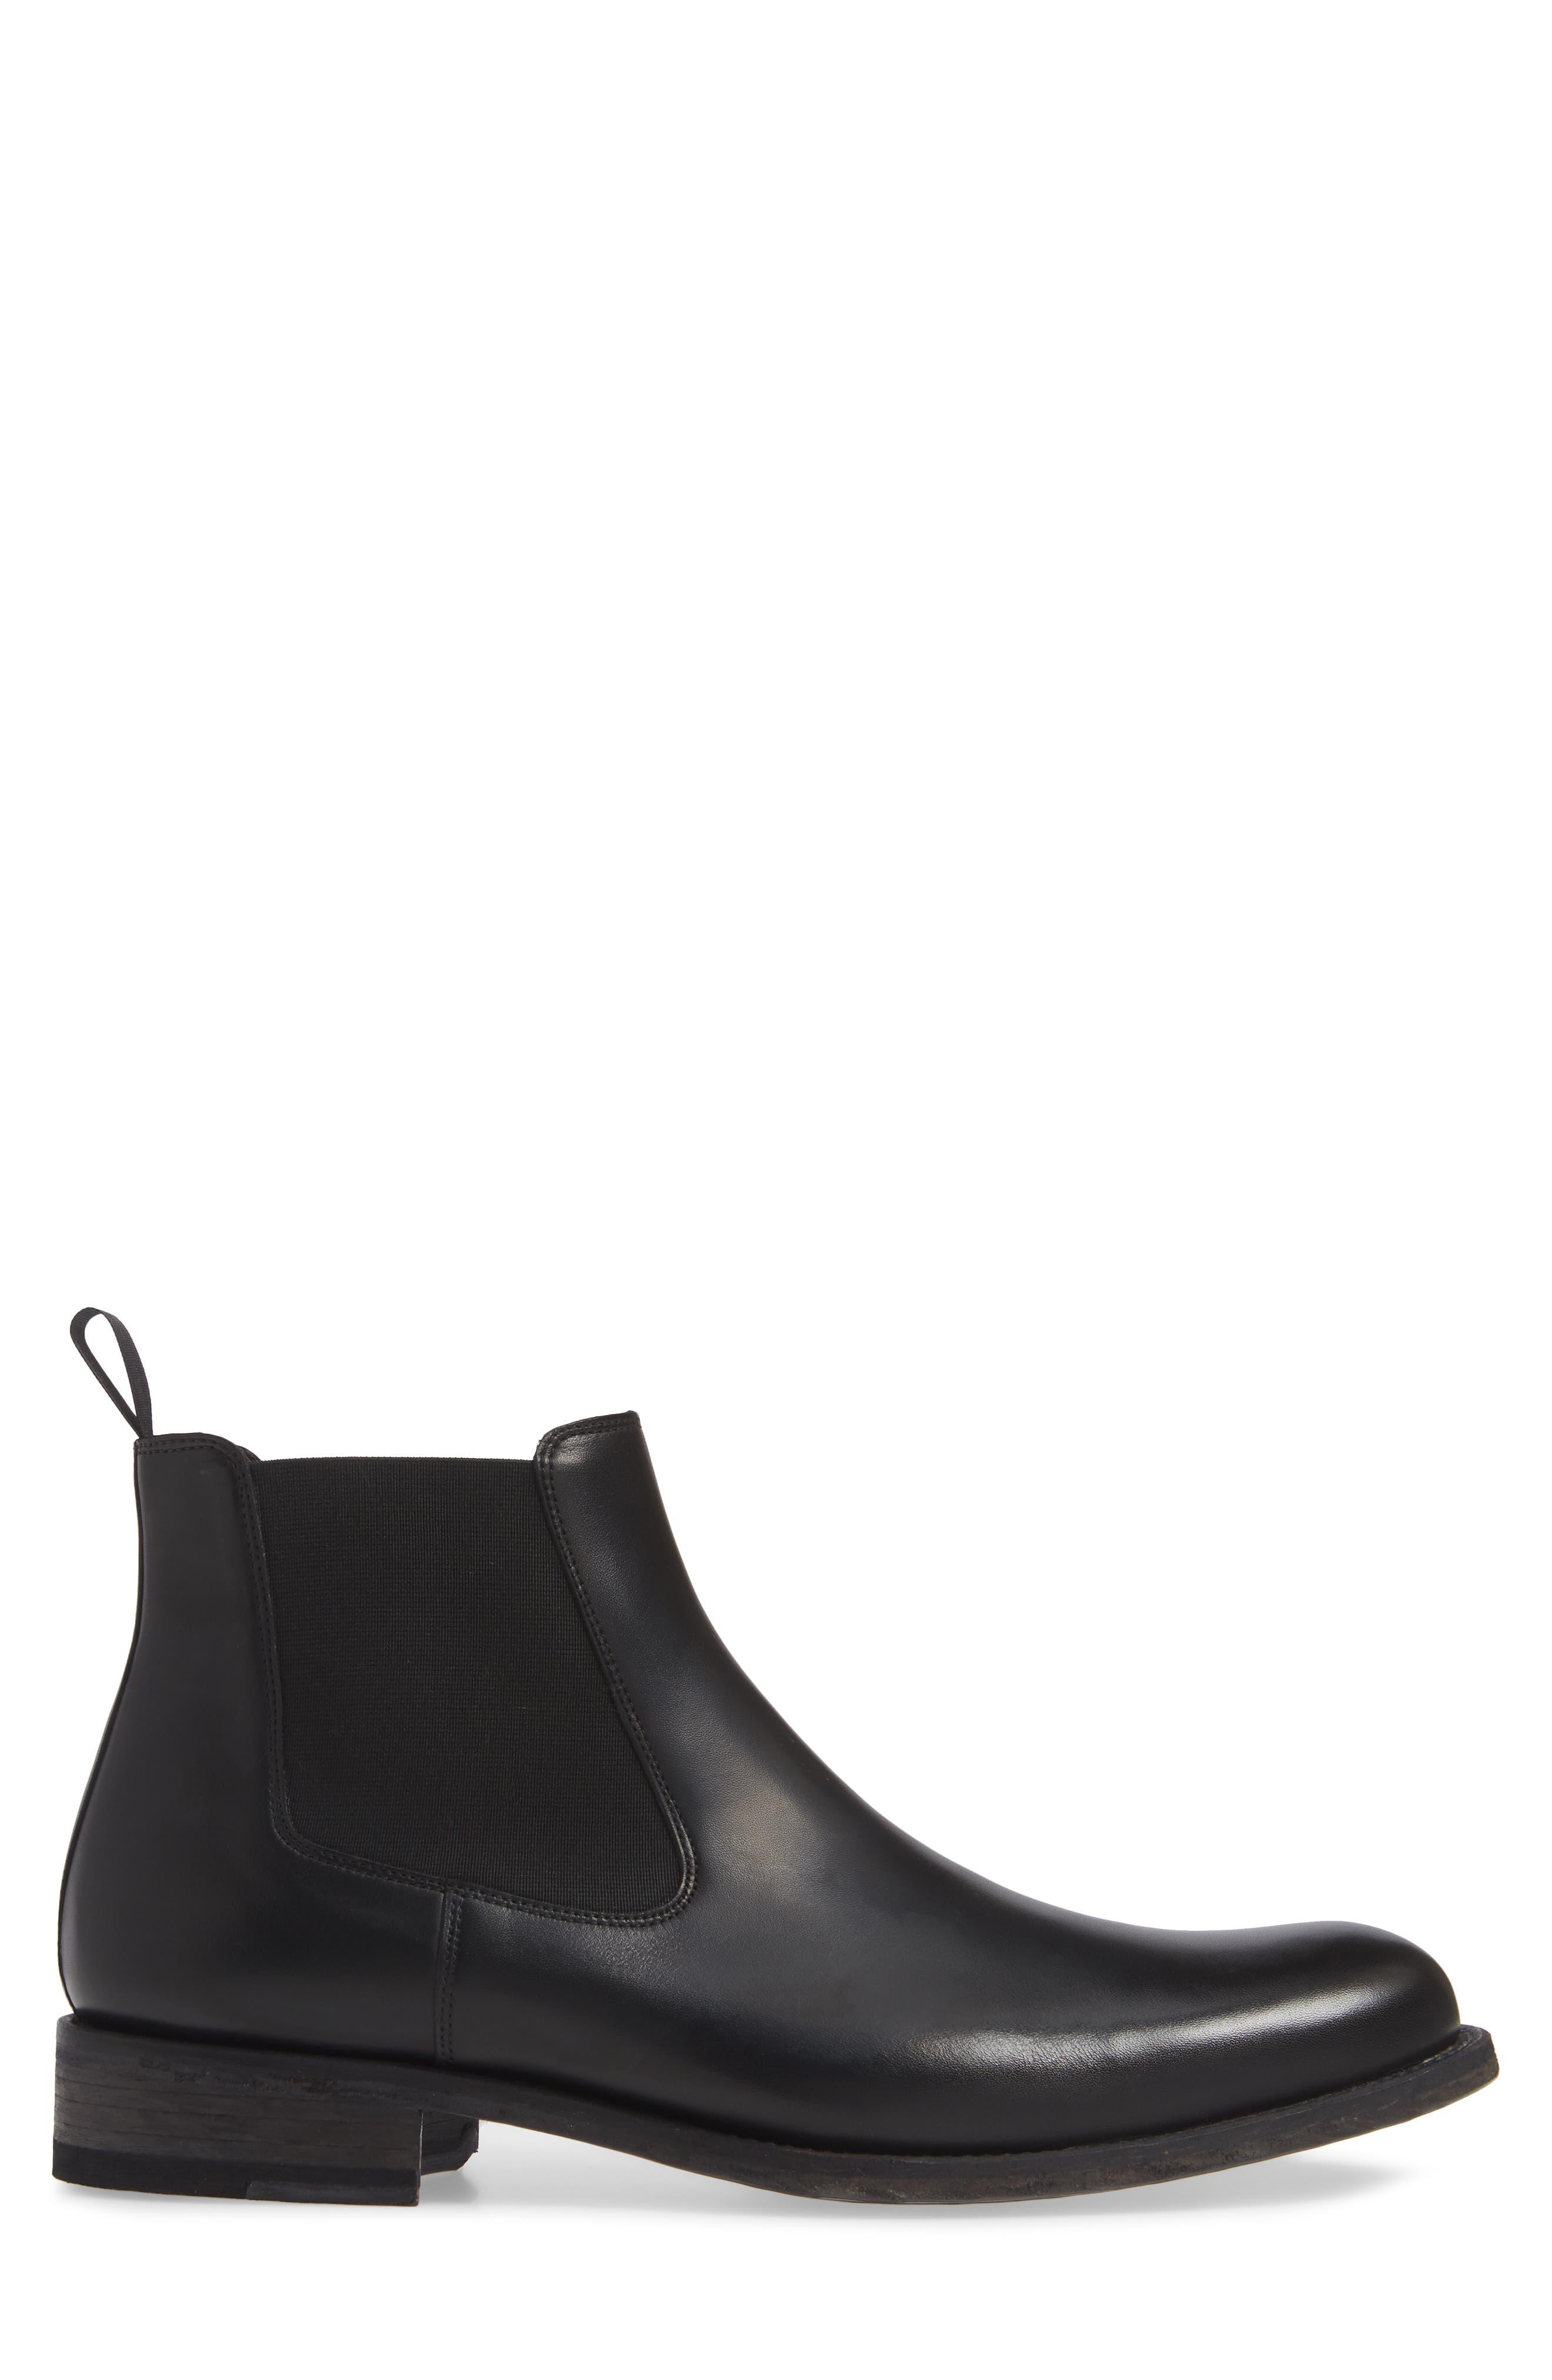 Saburo Water Resistant Chelsea Boot,                             Alternate thumbnail 3, color,                             BLACK LEATHER